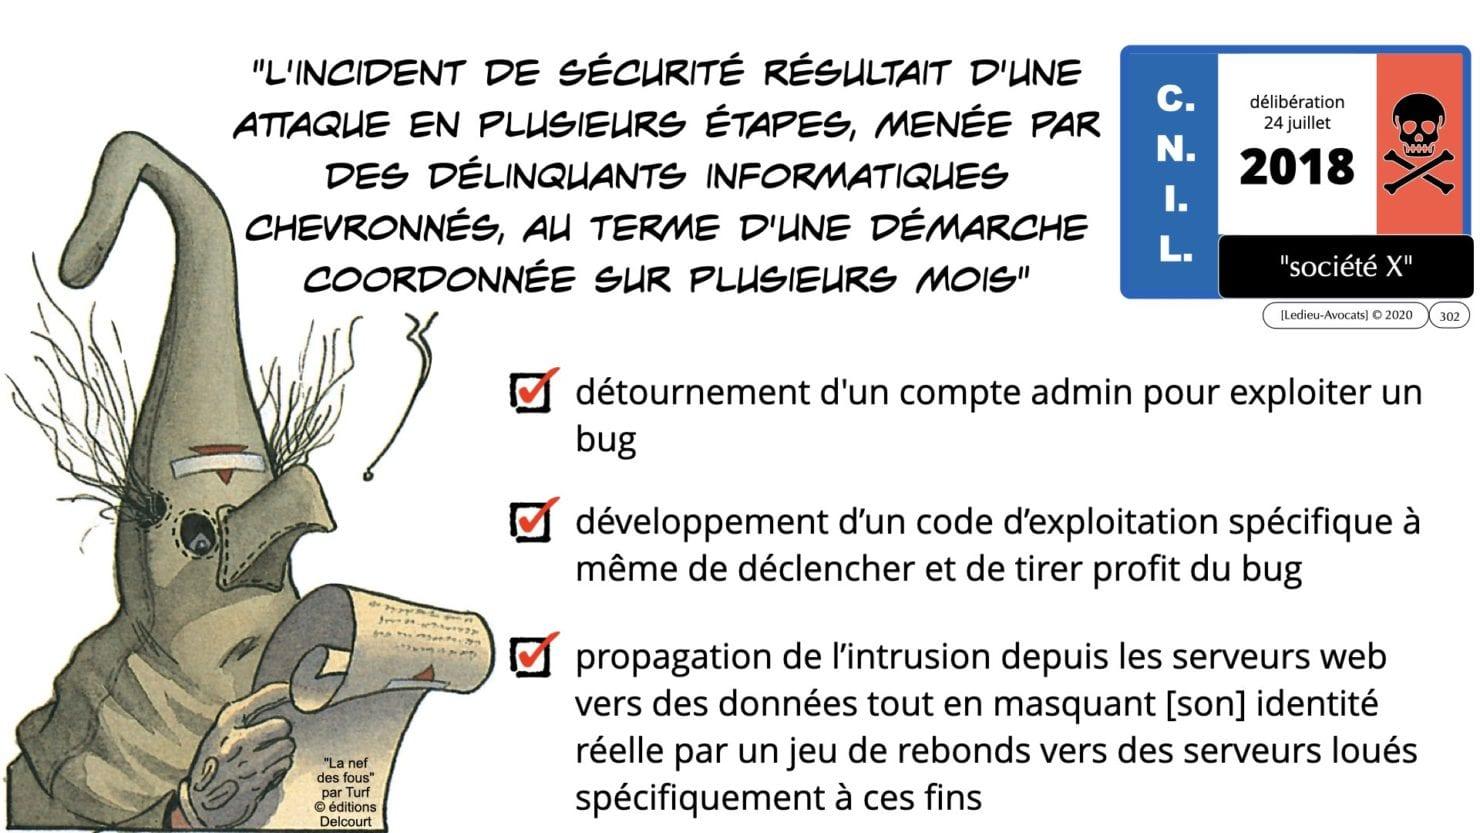 RGPD e-Privacy principes actualité jurisprudence ©Ledieu-Avocats 25-06-2021.302